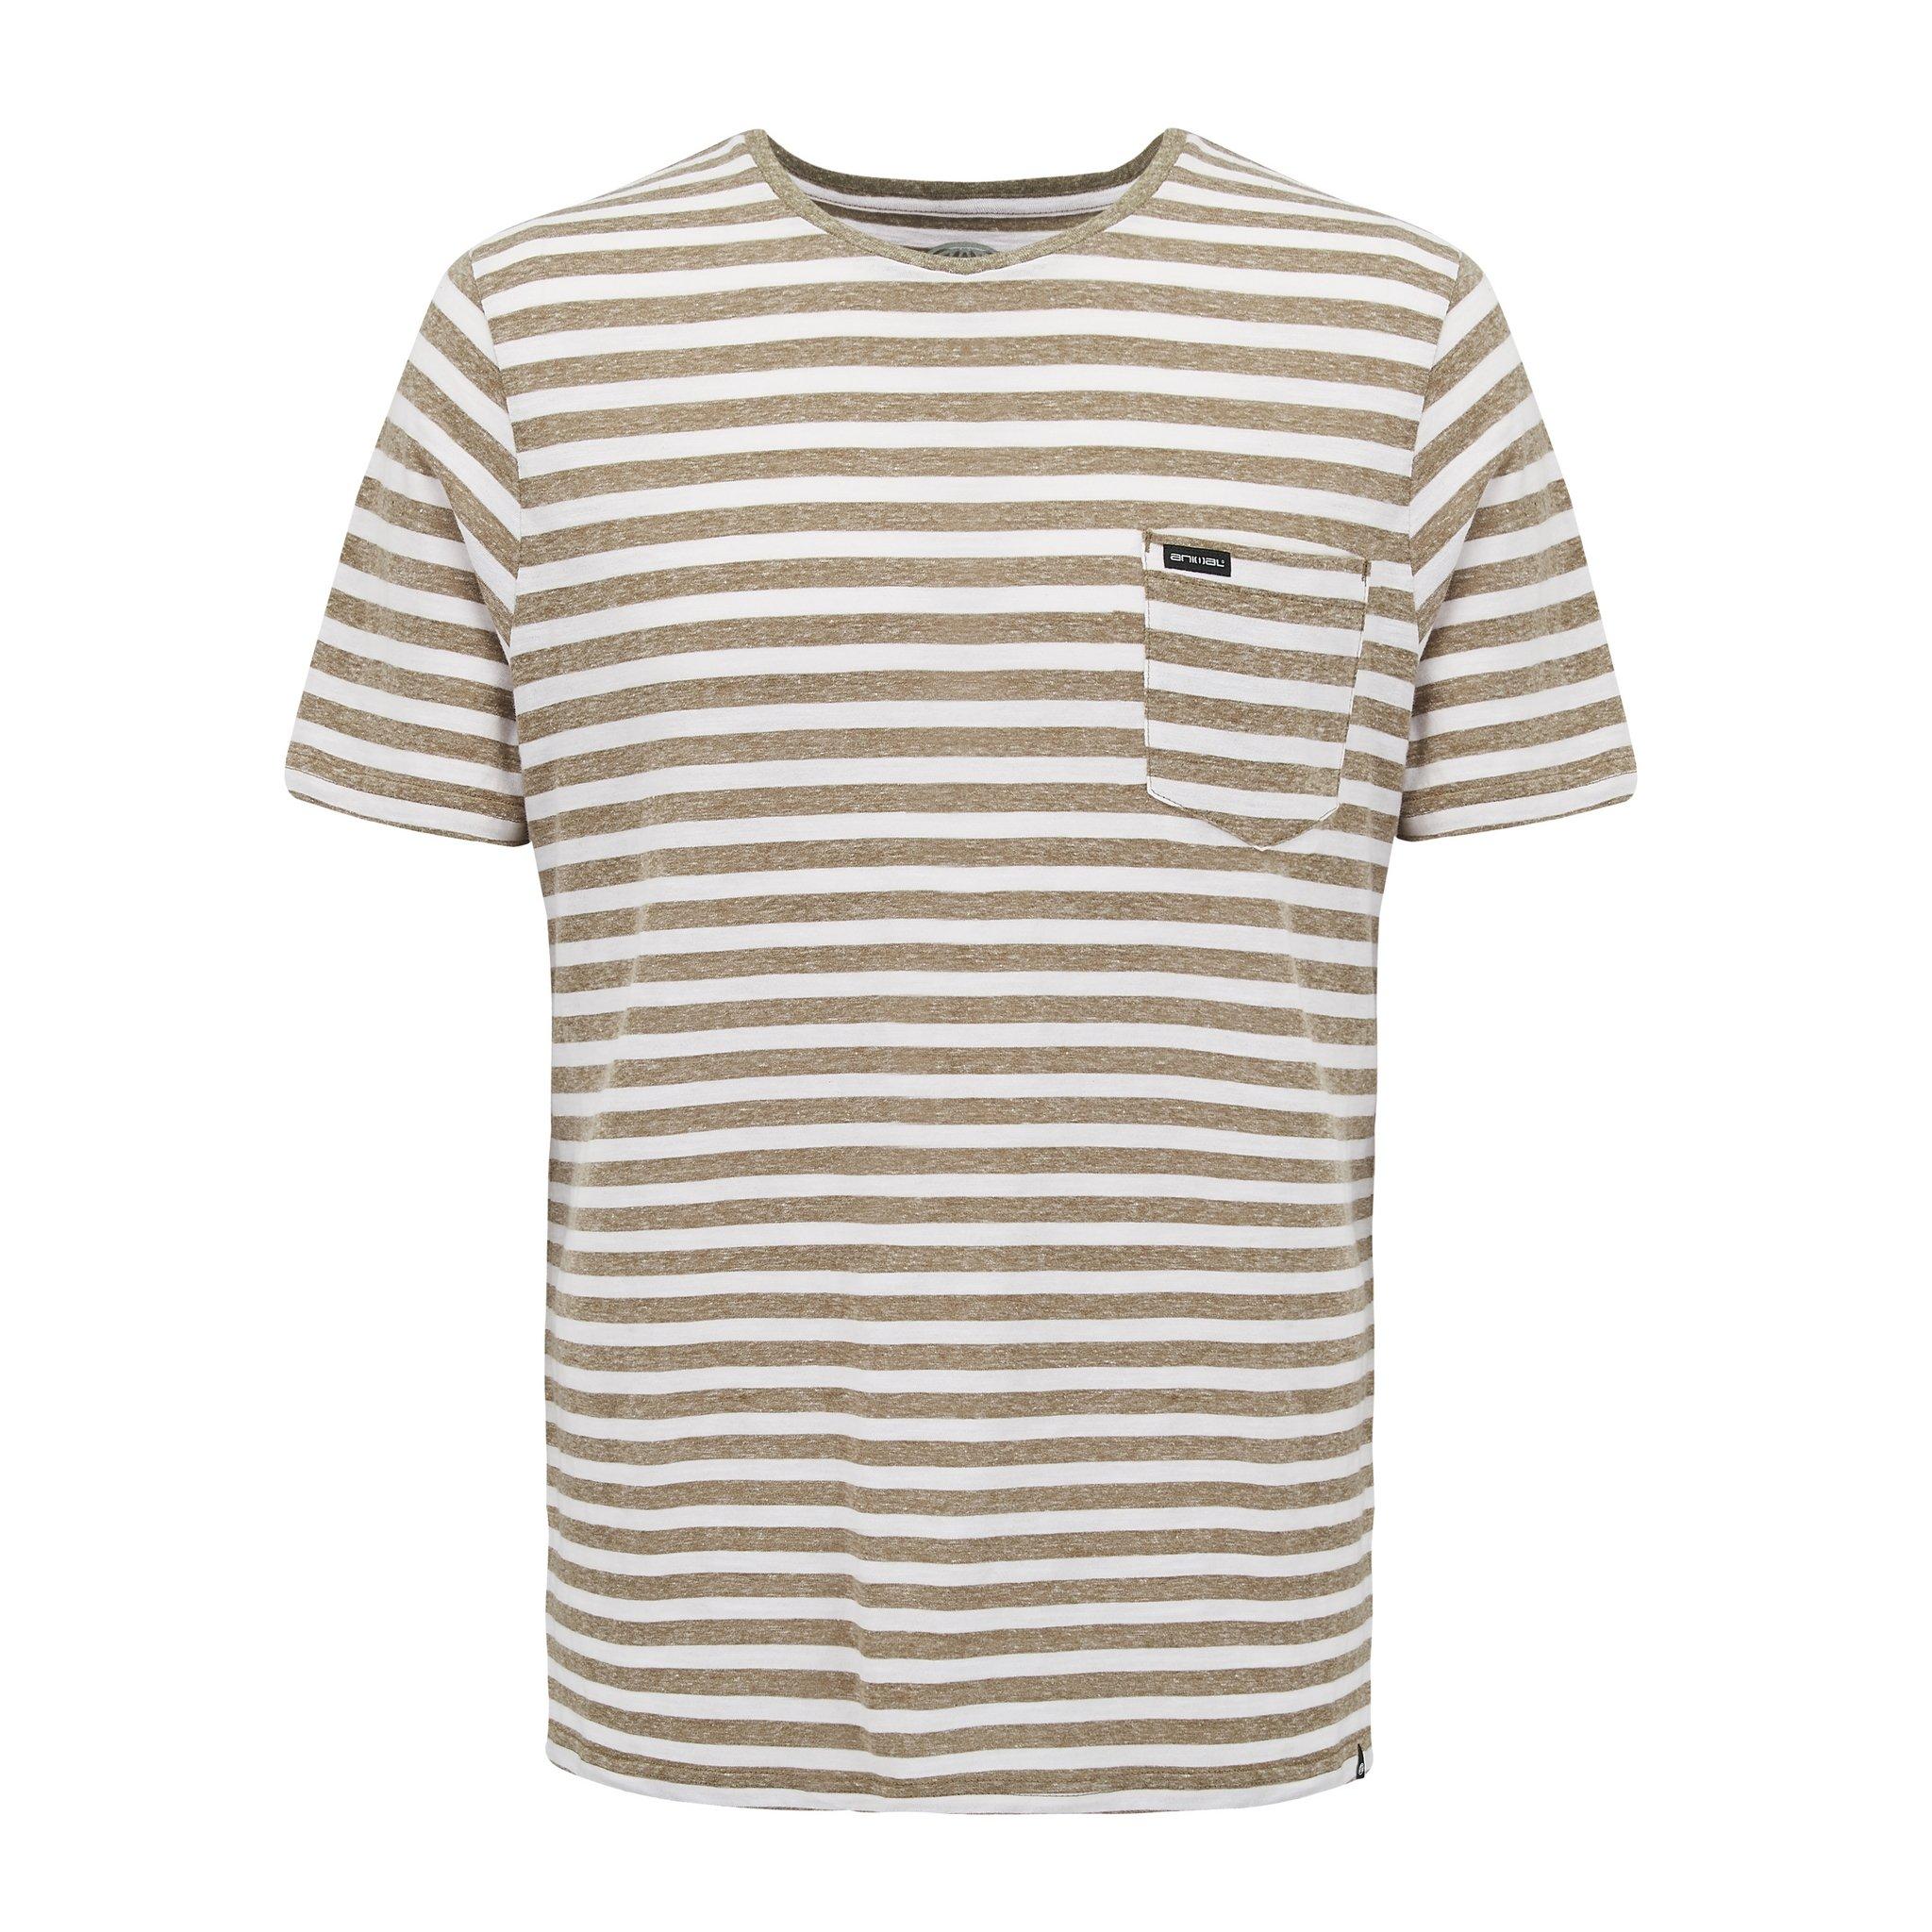 Animal Clothing Men's Pocket T-Shirt Grey - S Green